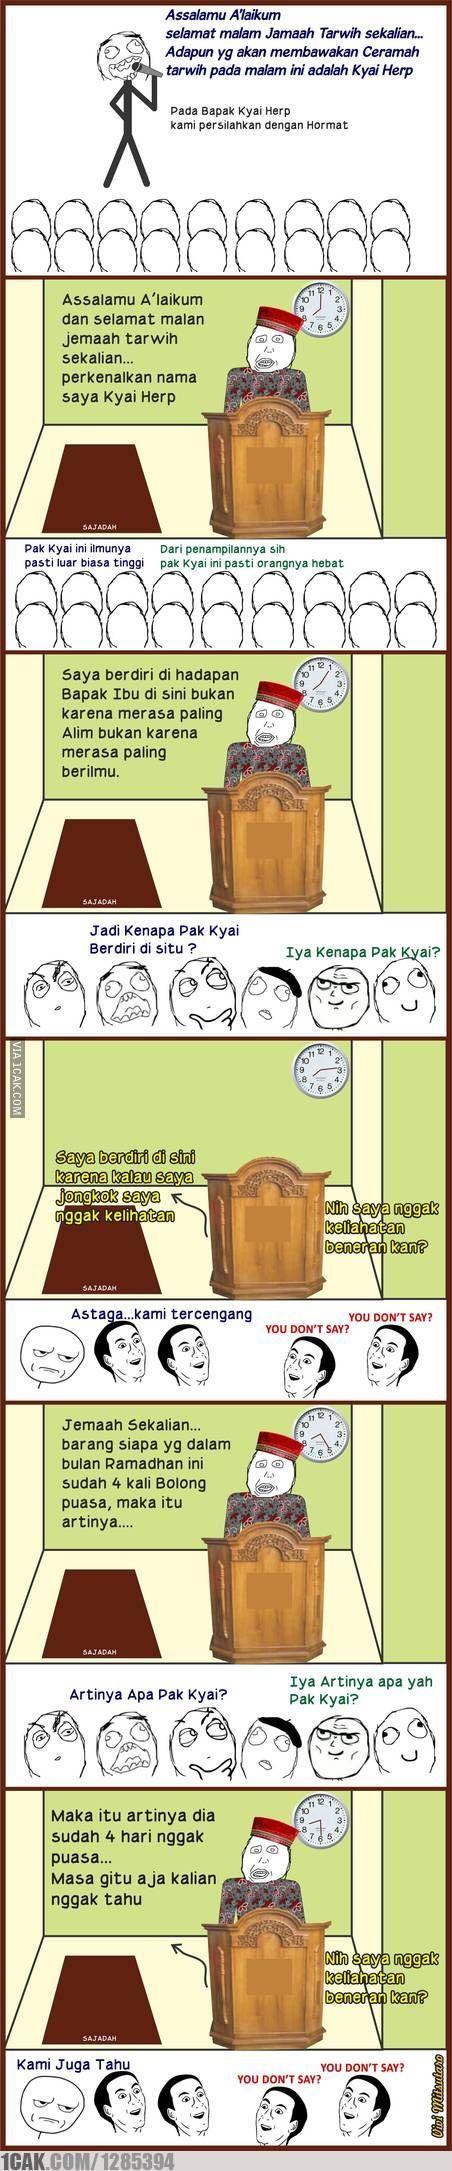 Best 25 Meme Indonesia Ideas On Pinterest Memes De America